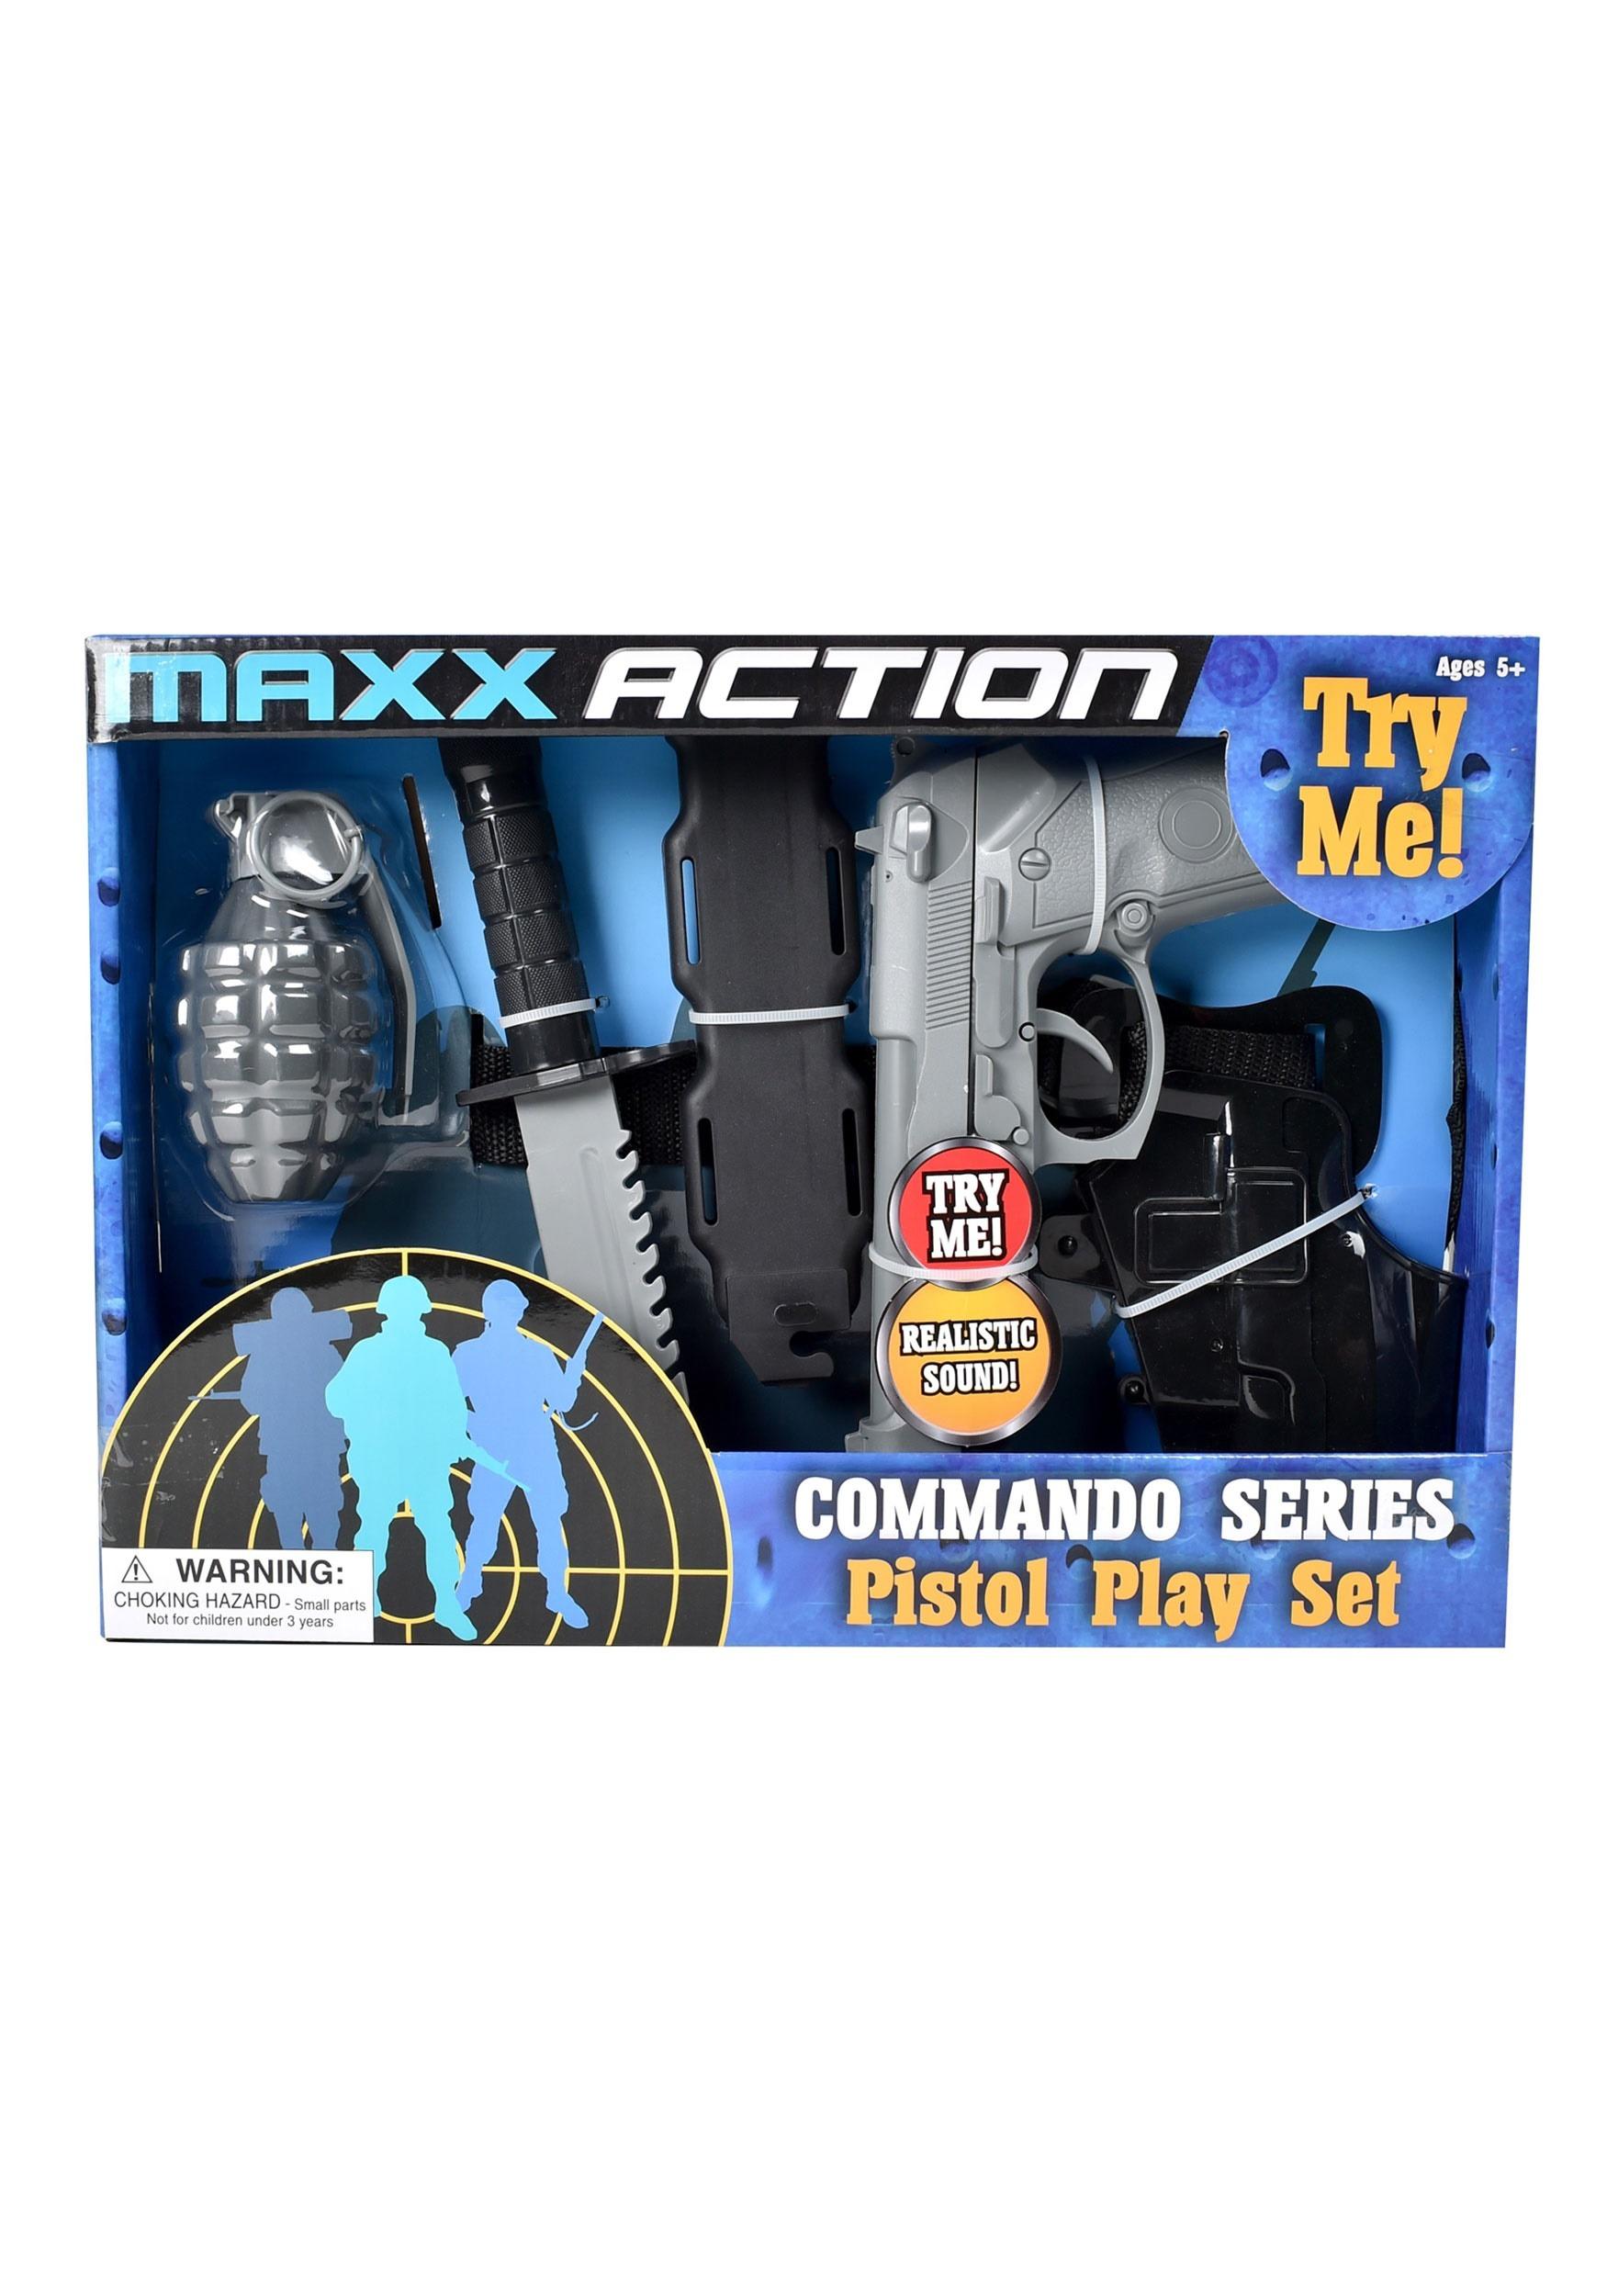 Maxx Action Commando Series Pistol Playset